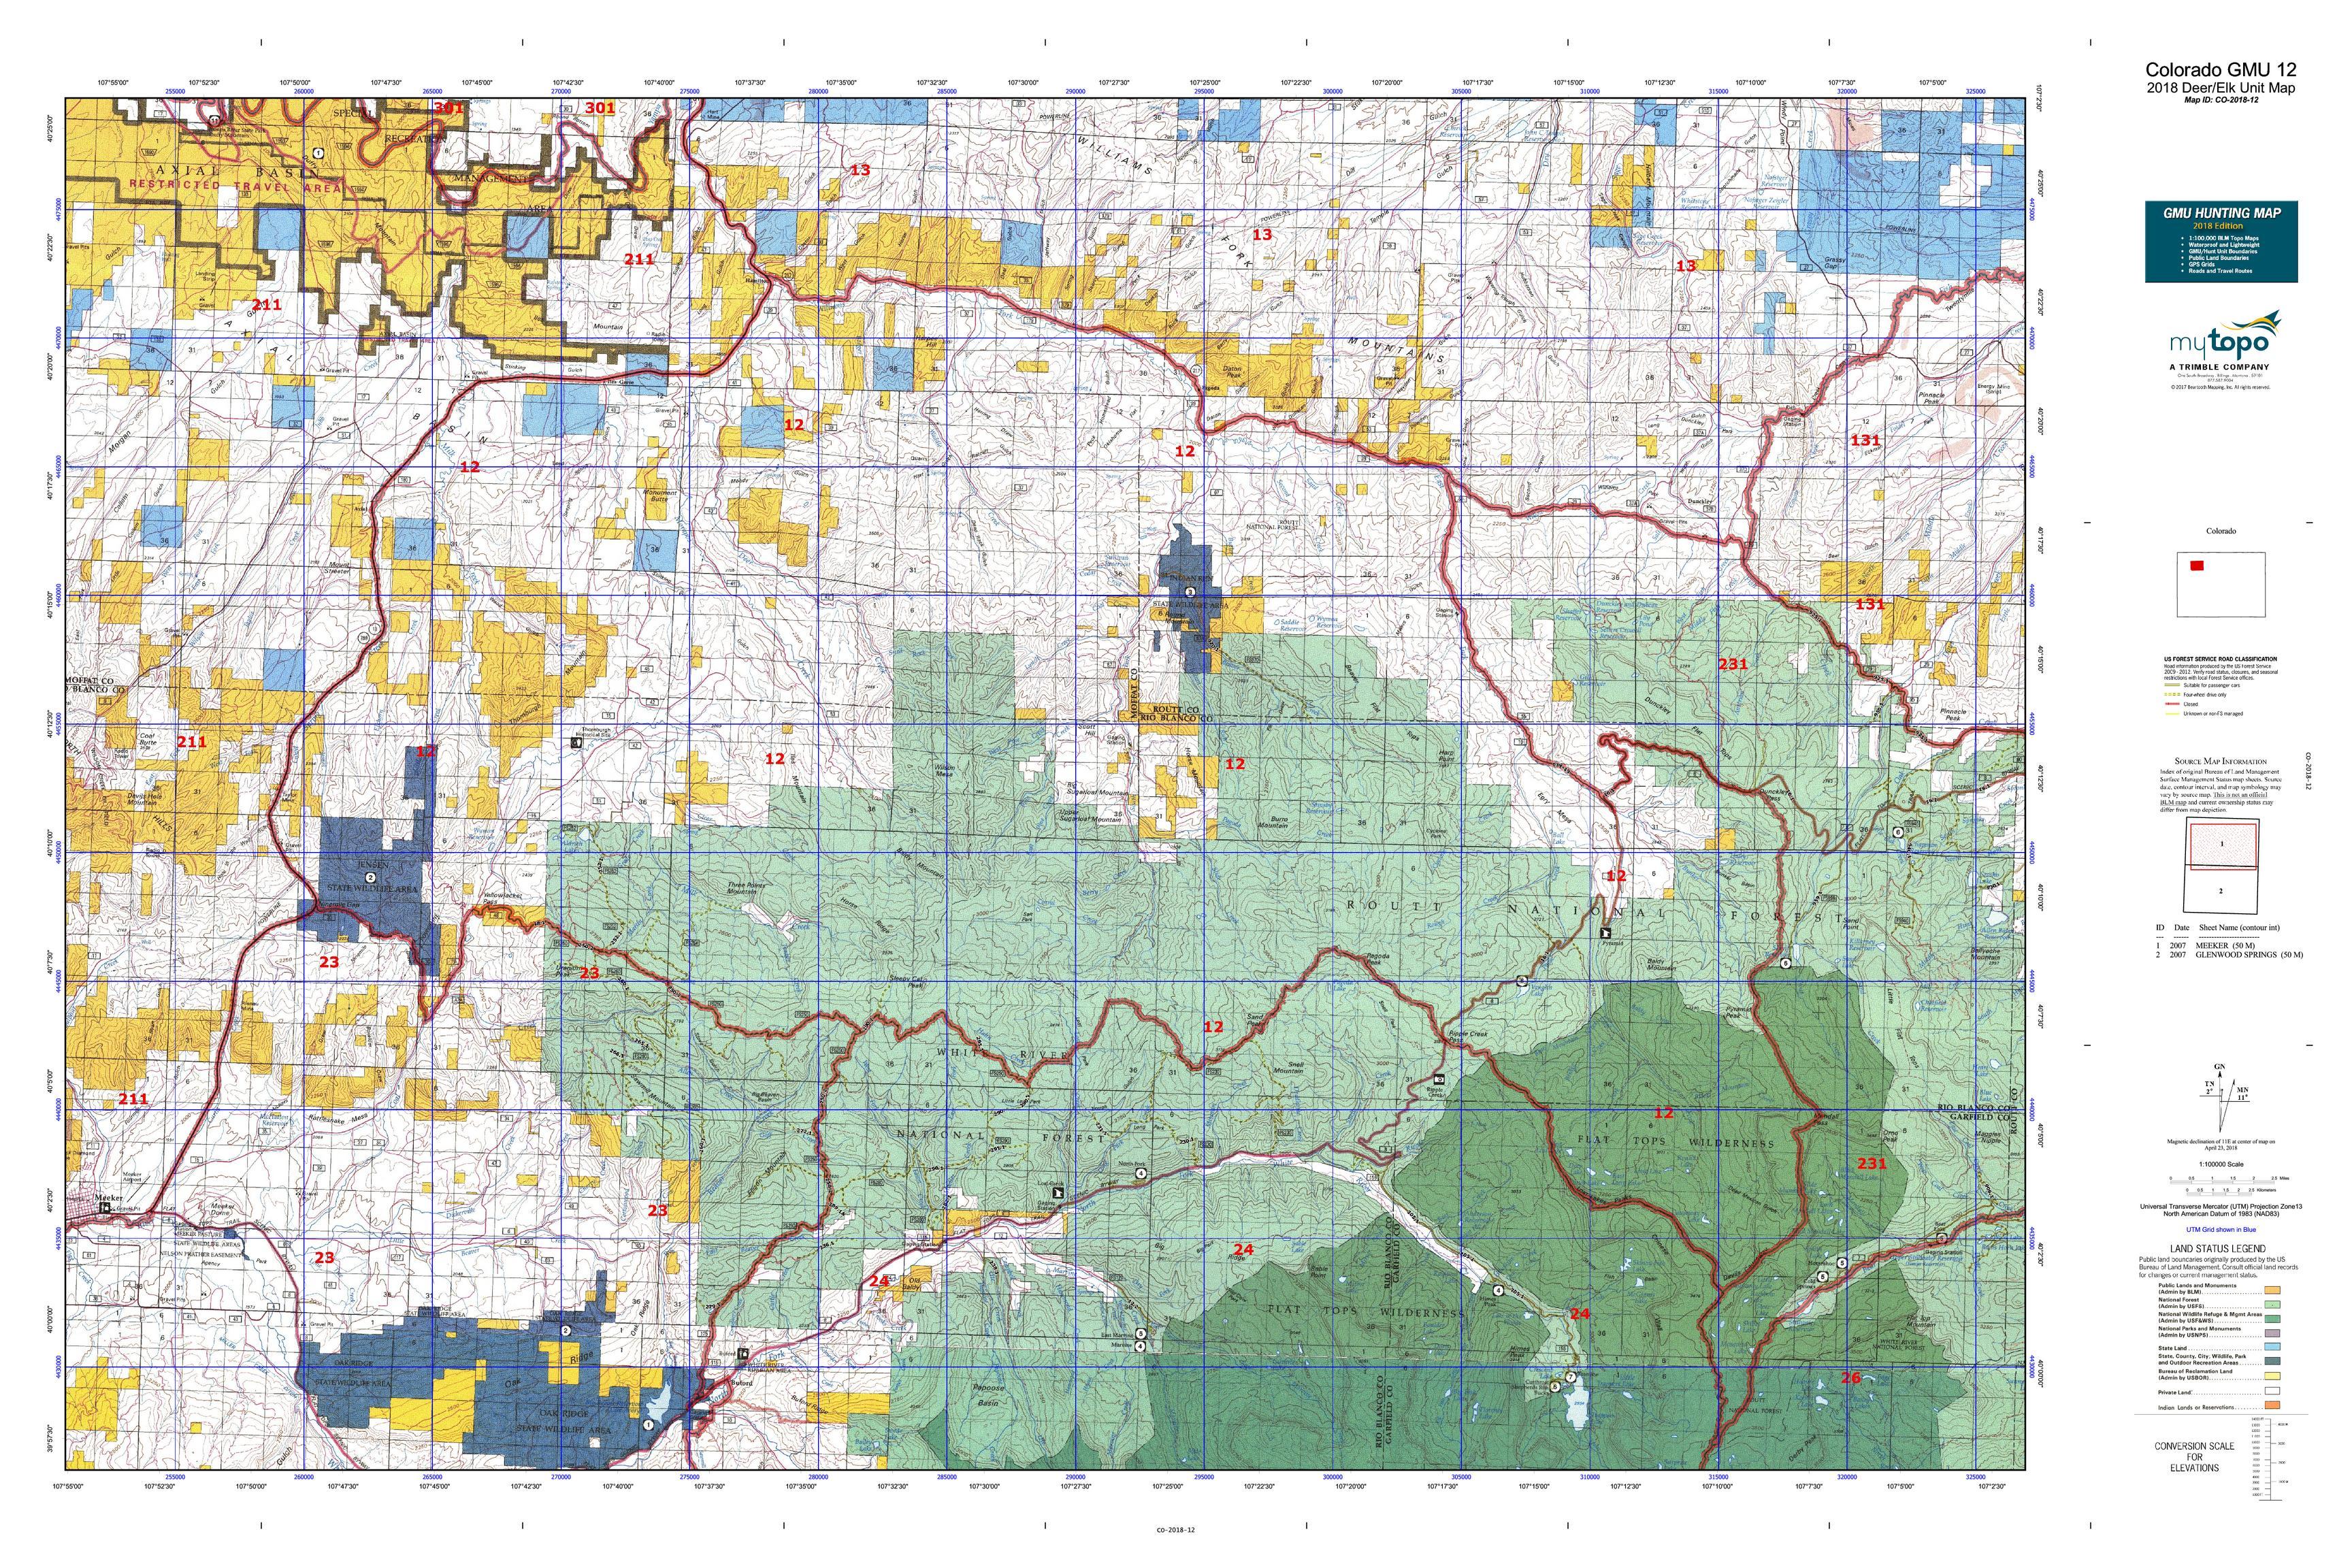 Colorado GMU 12 Map | MyTopo